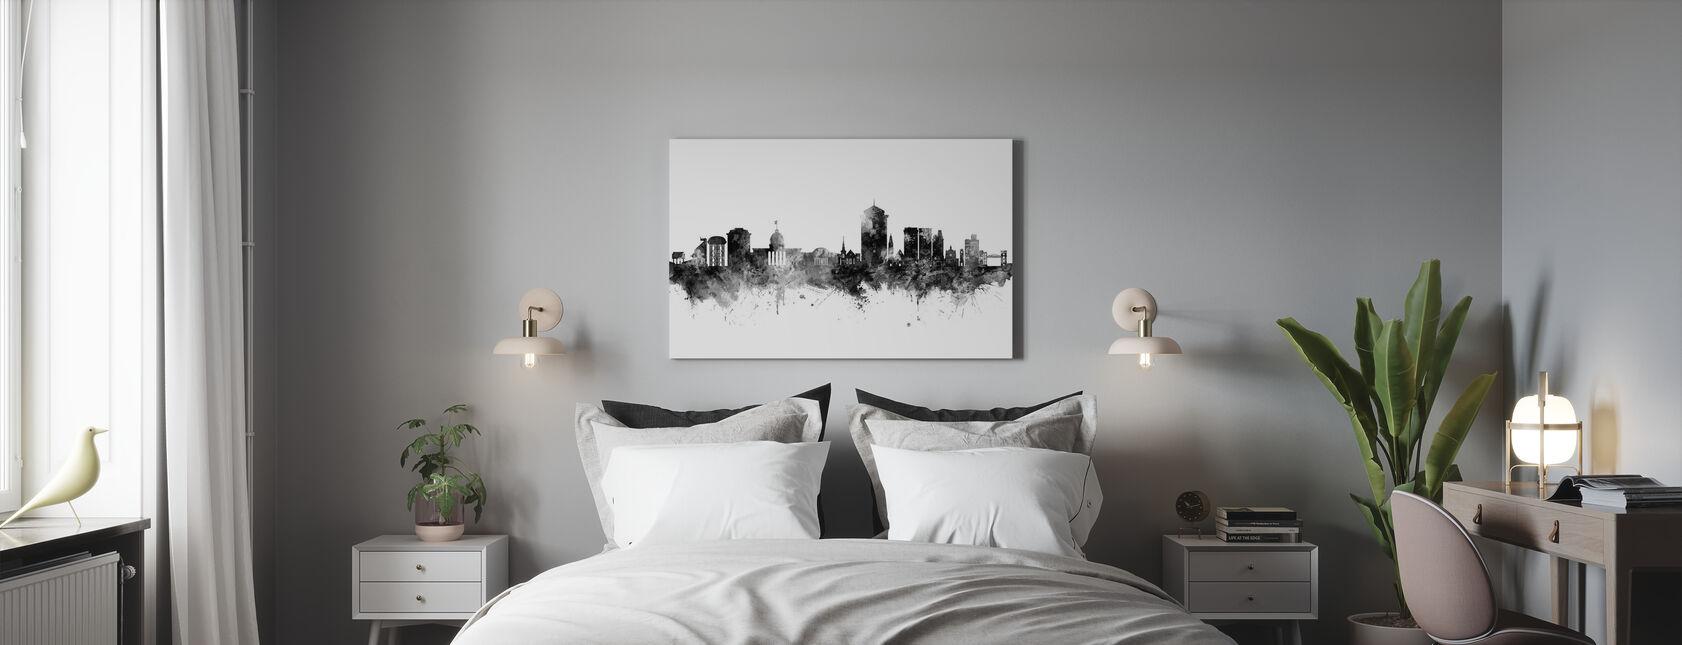 Montgomery Alabama Skyline - Canvas print - Bedroom